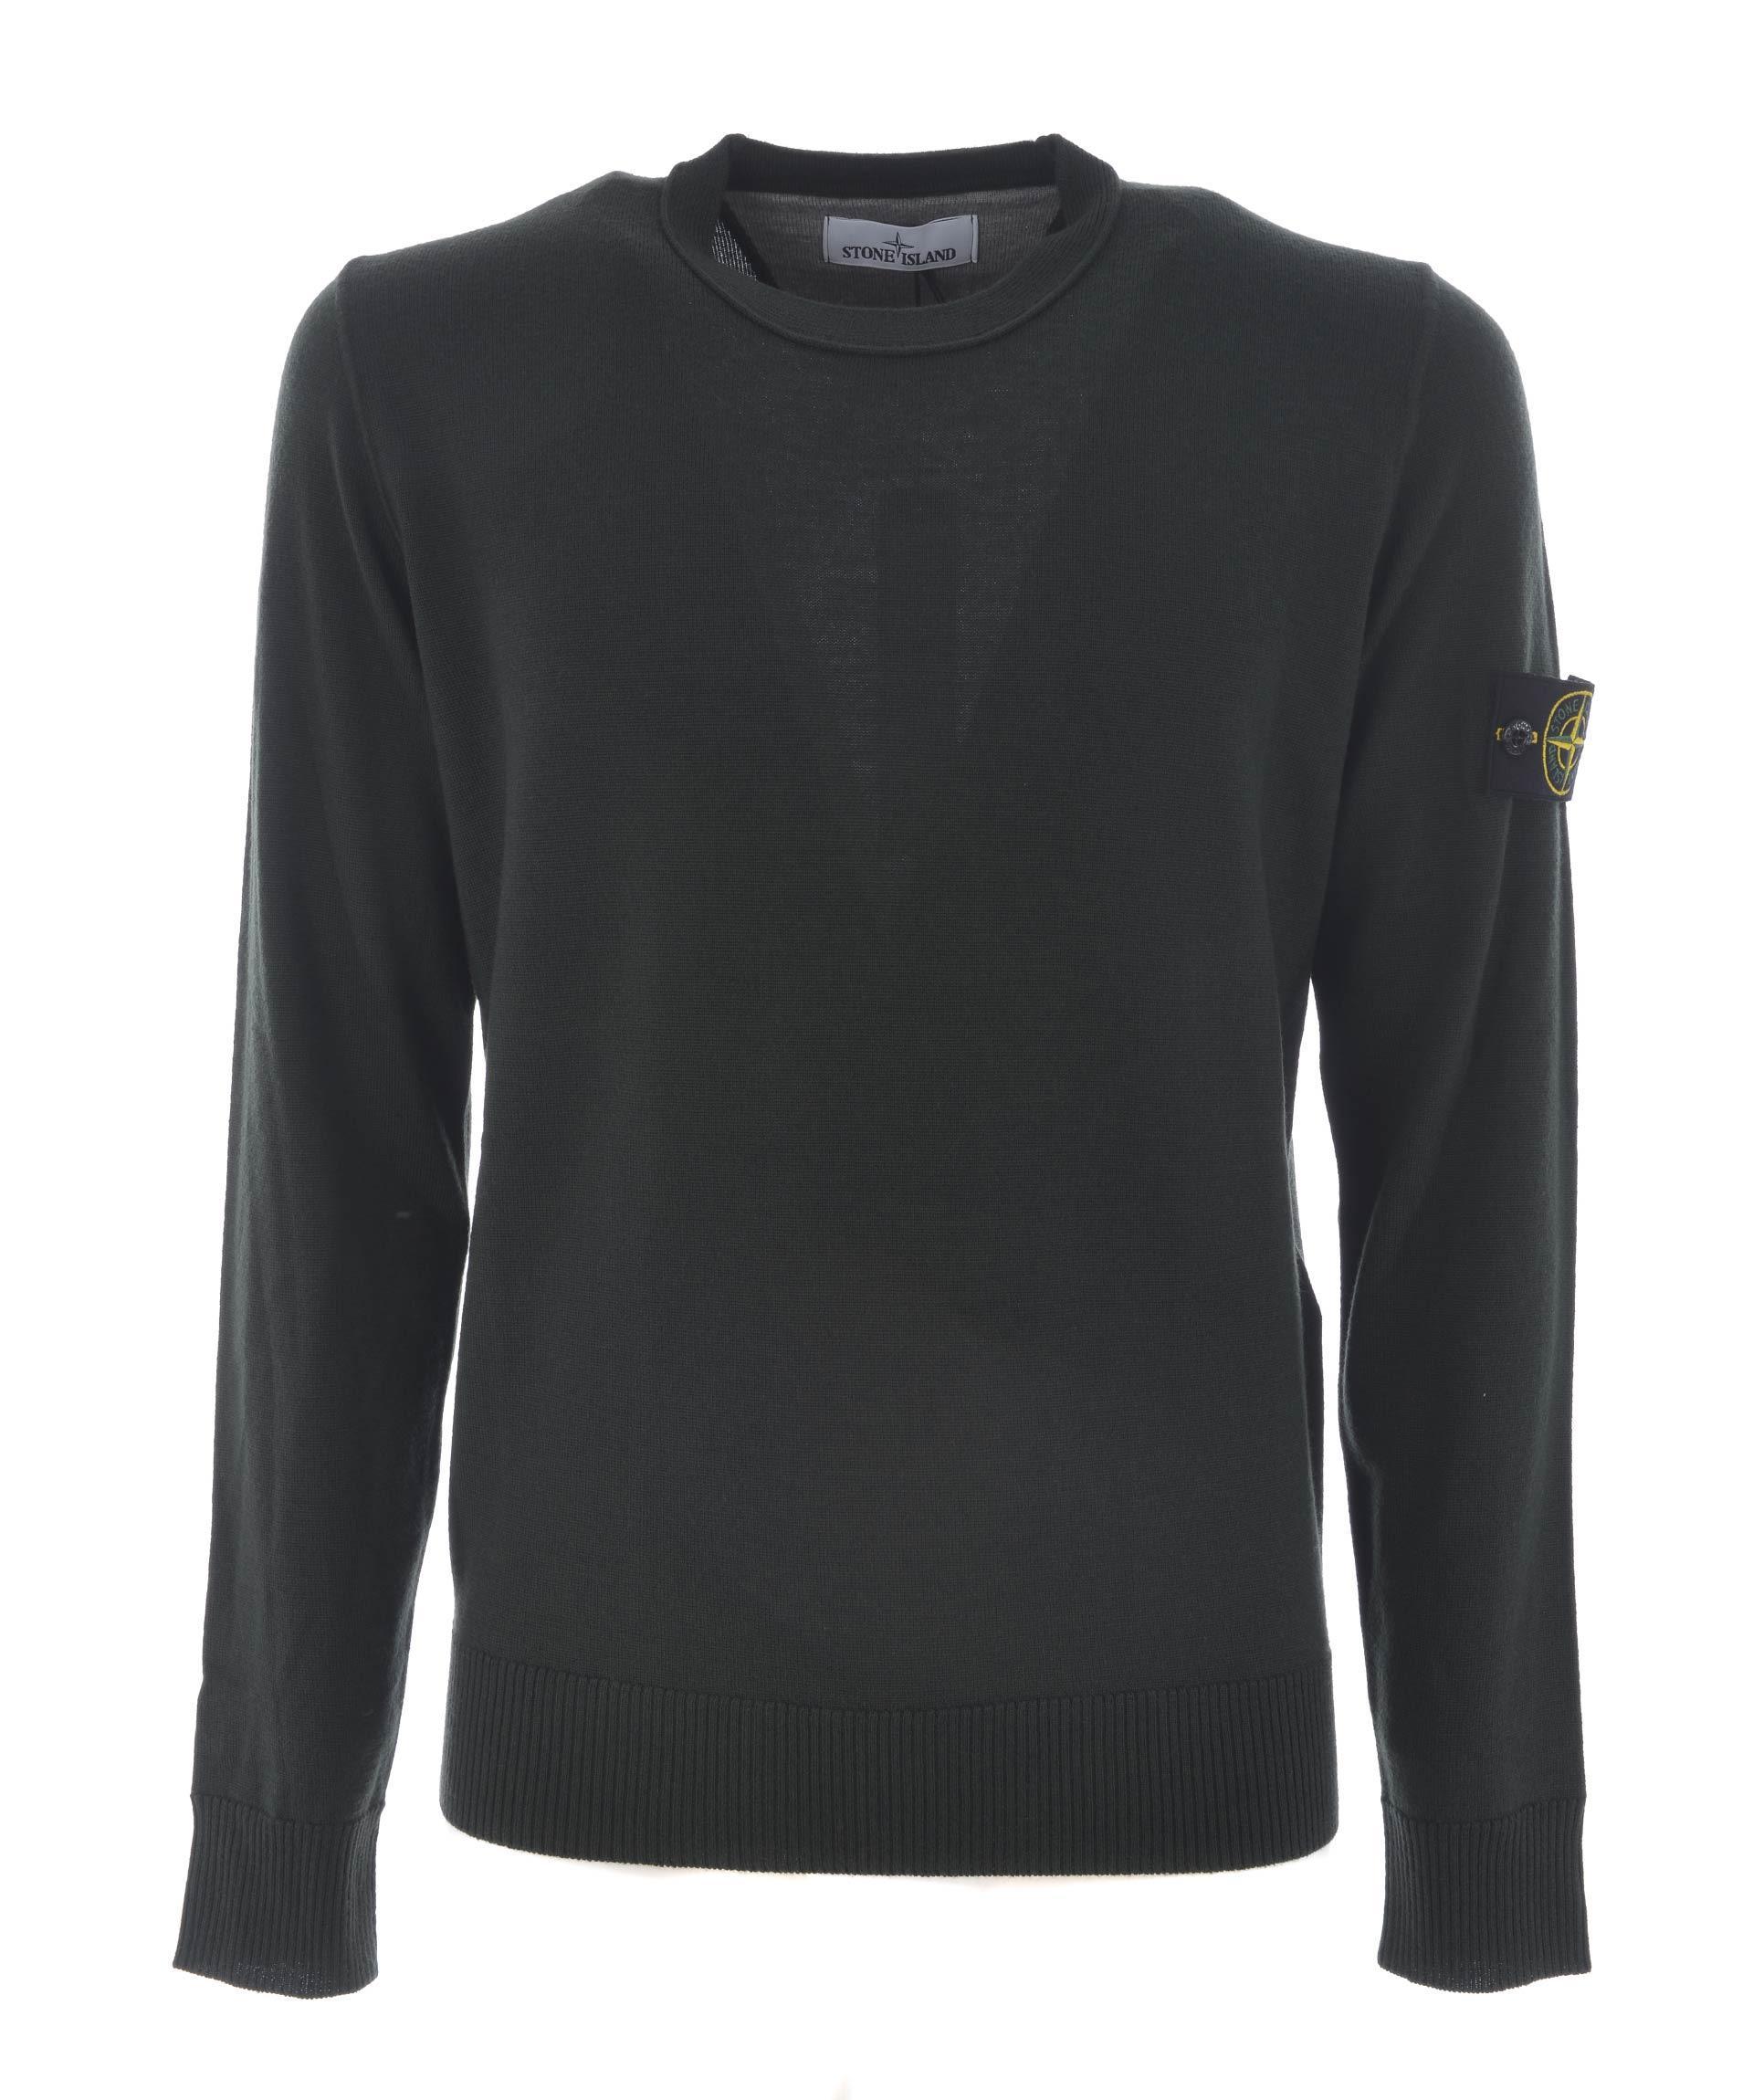 Stone Island Patch Detail Jersey Sweatshirt